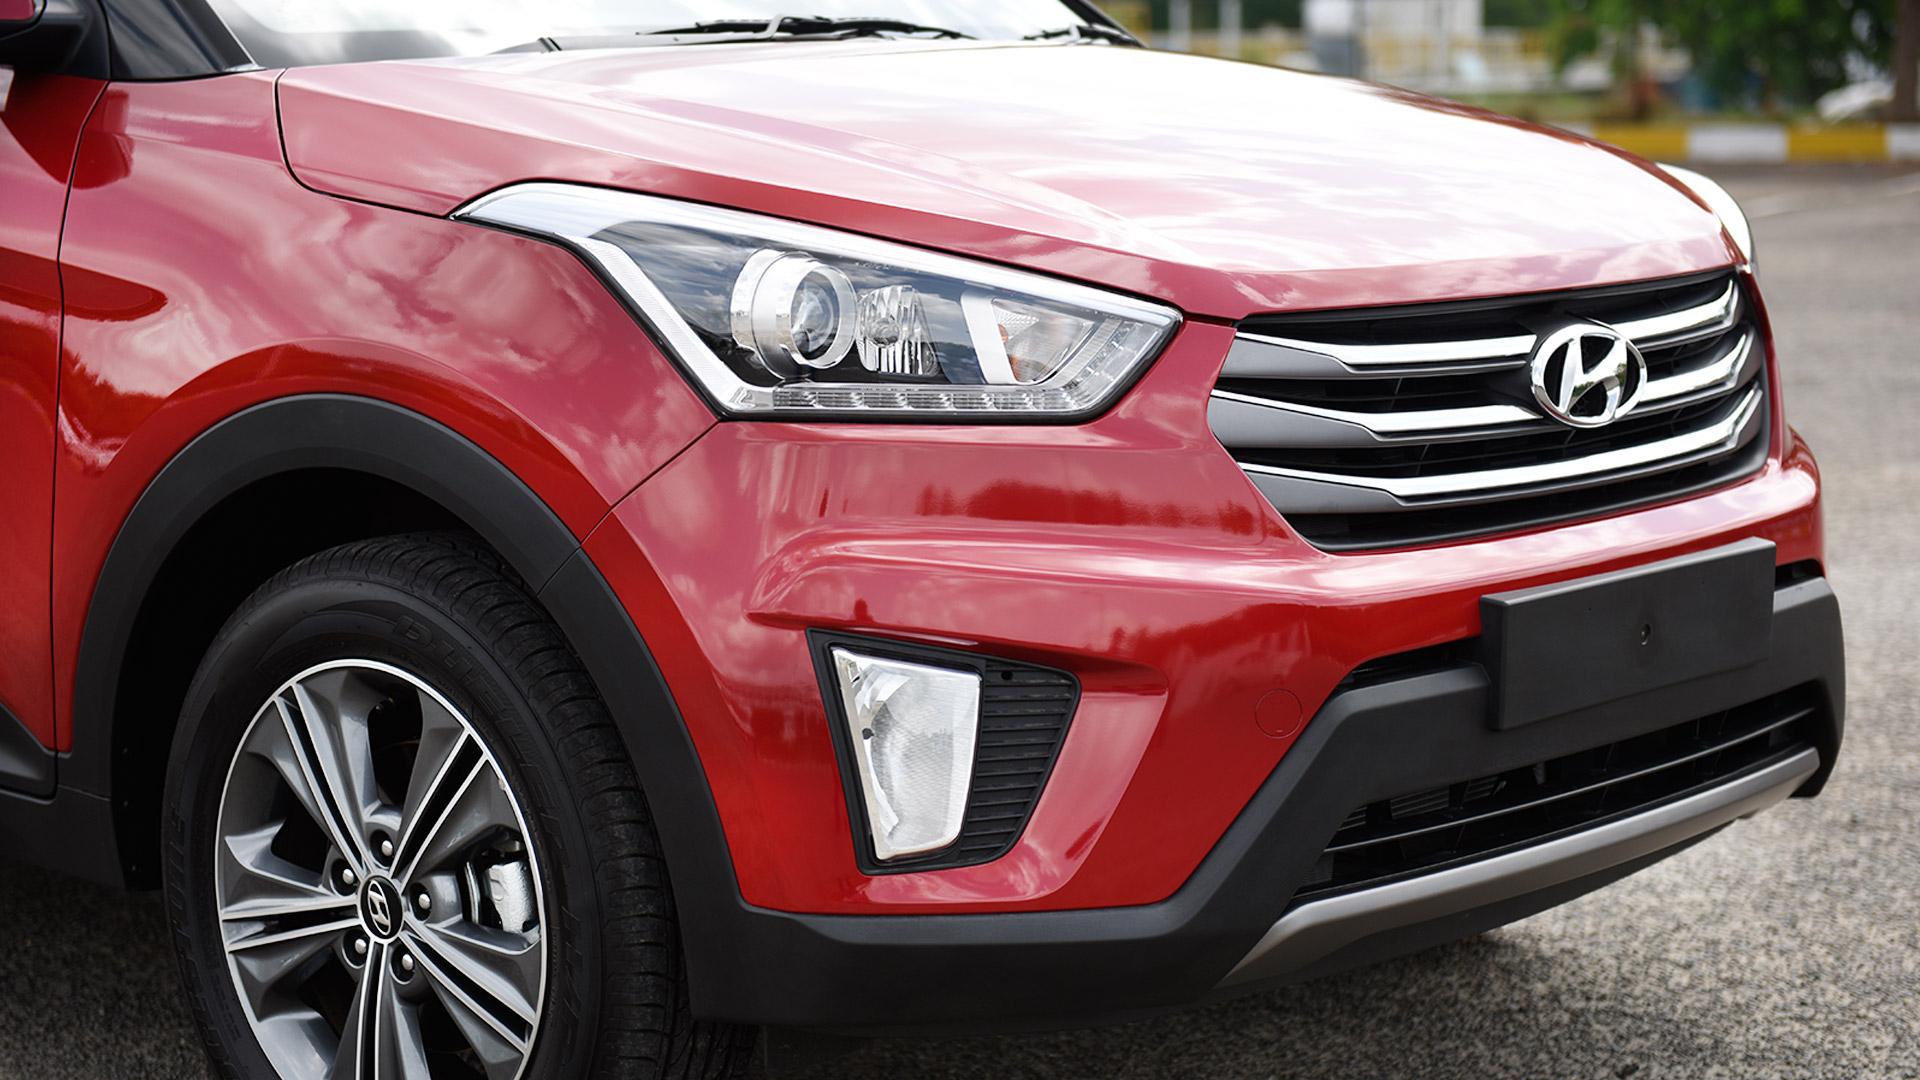 Hyundai Creta 2015 1.6 S Petrol Exterior